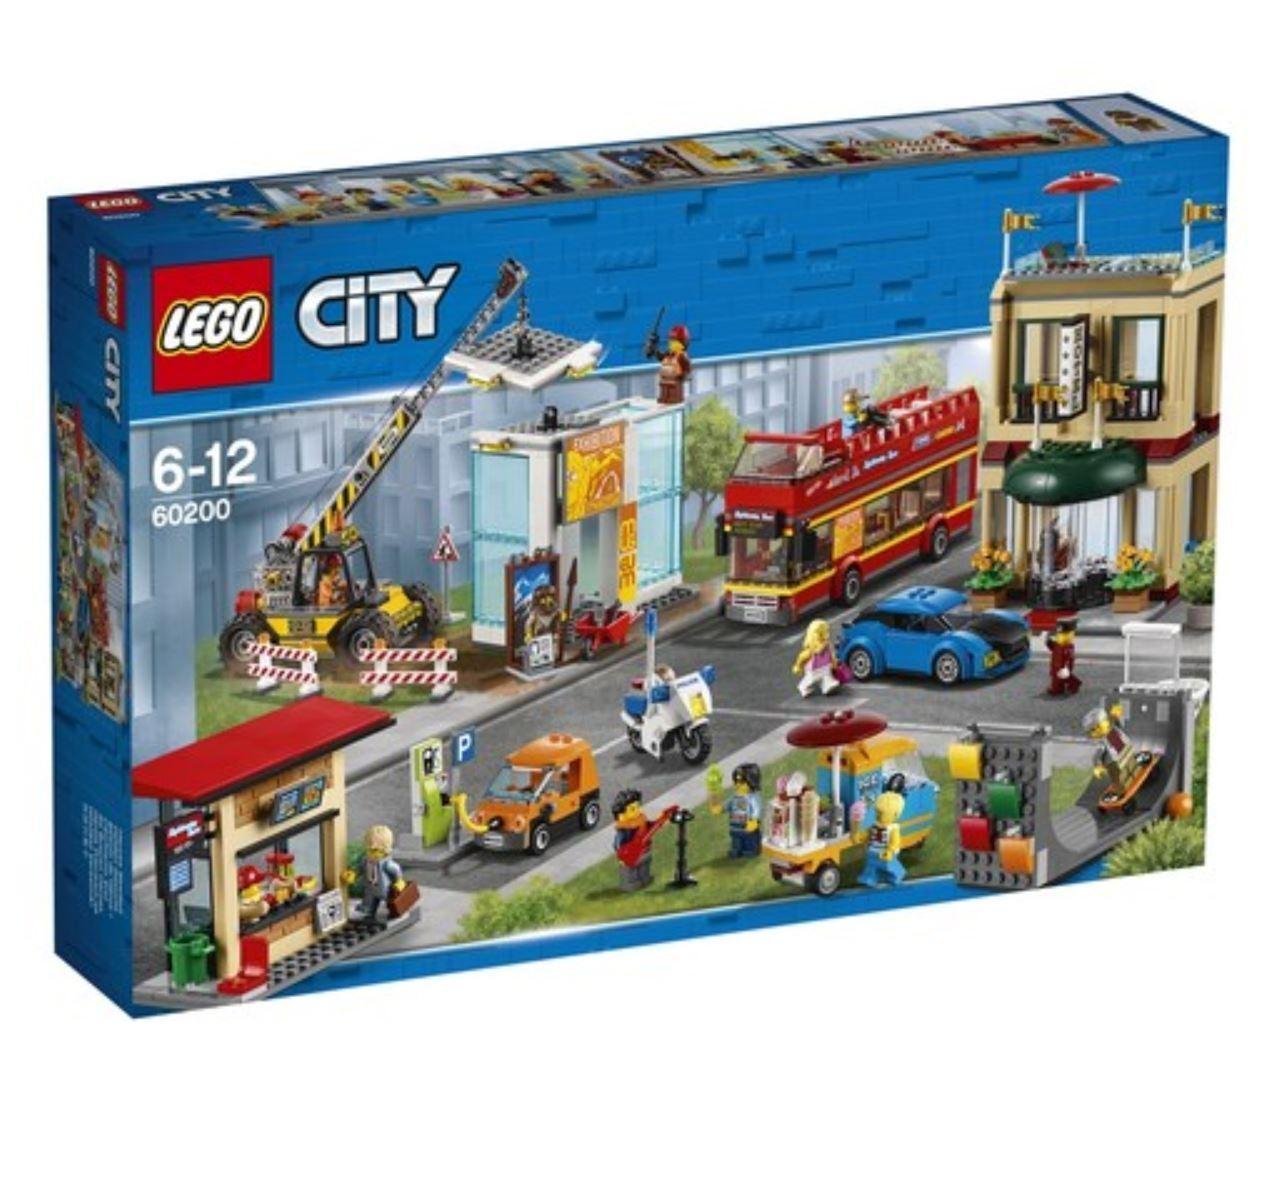 [LEGO] City Capital City 60200 60200 60200 2018 Version Free Shipping ddd736